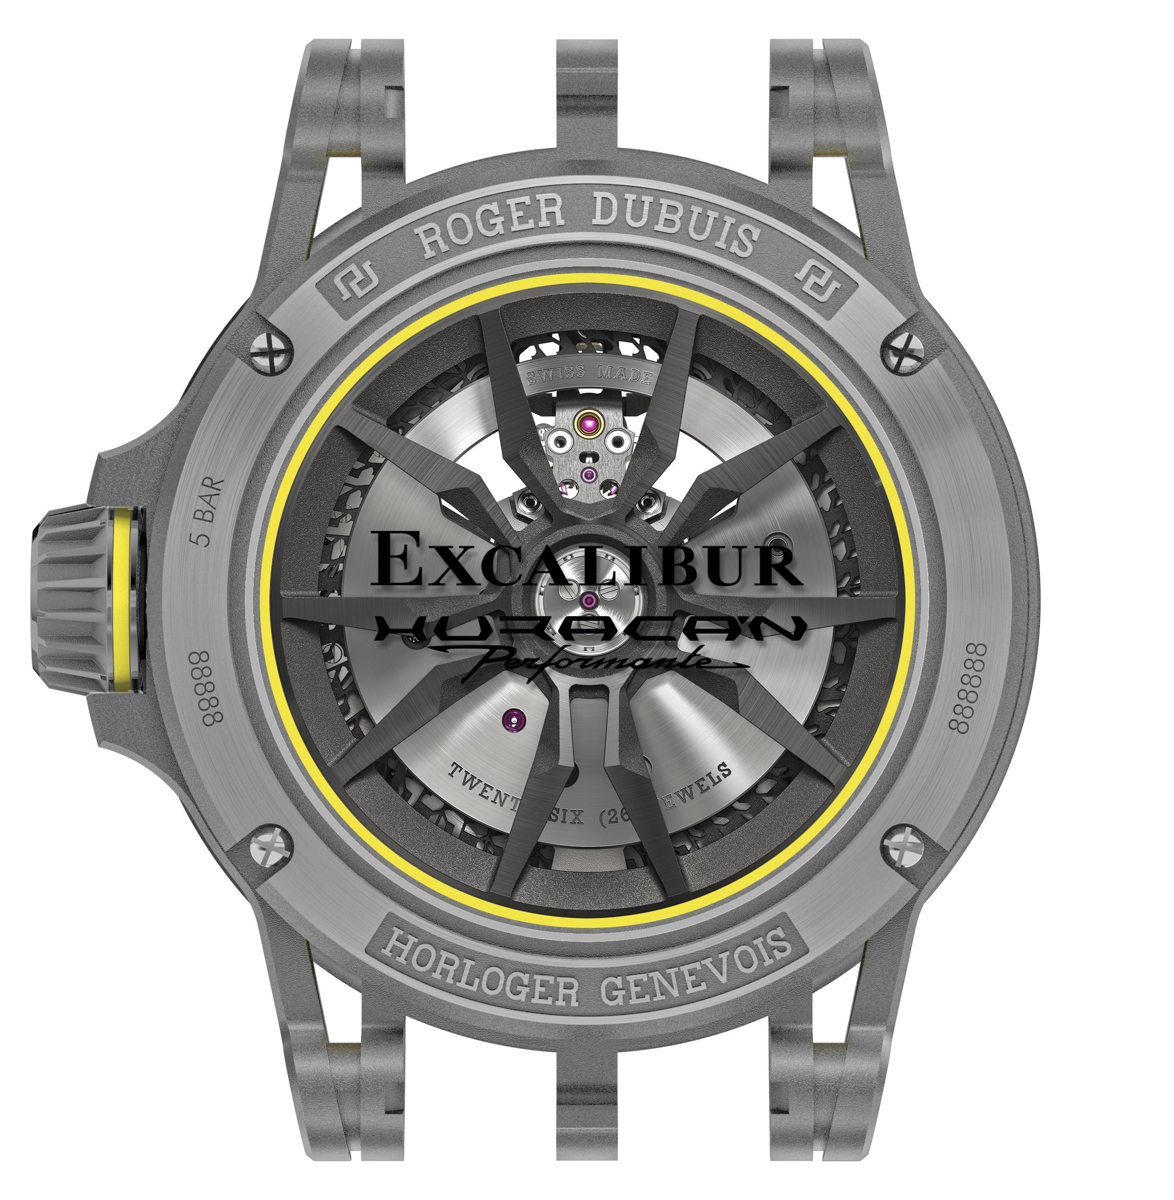 Roger Dubuis Excalibur Huracán Performante - Back